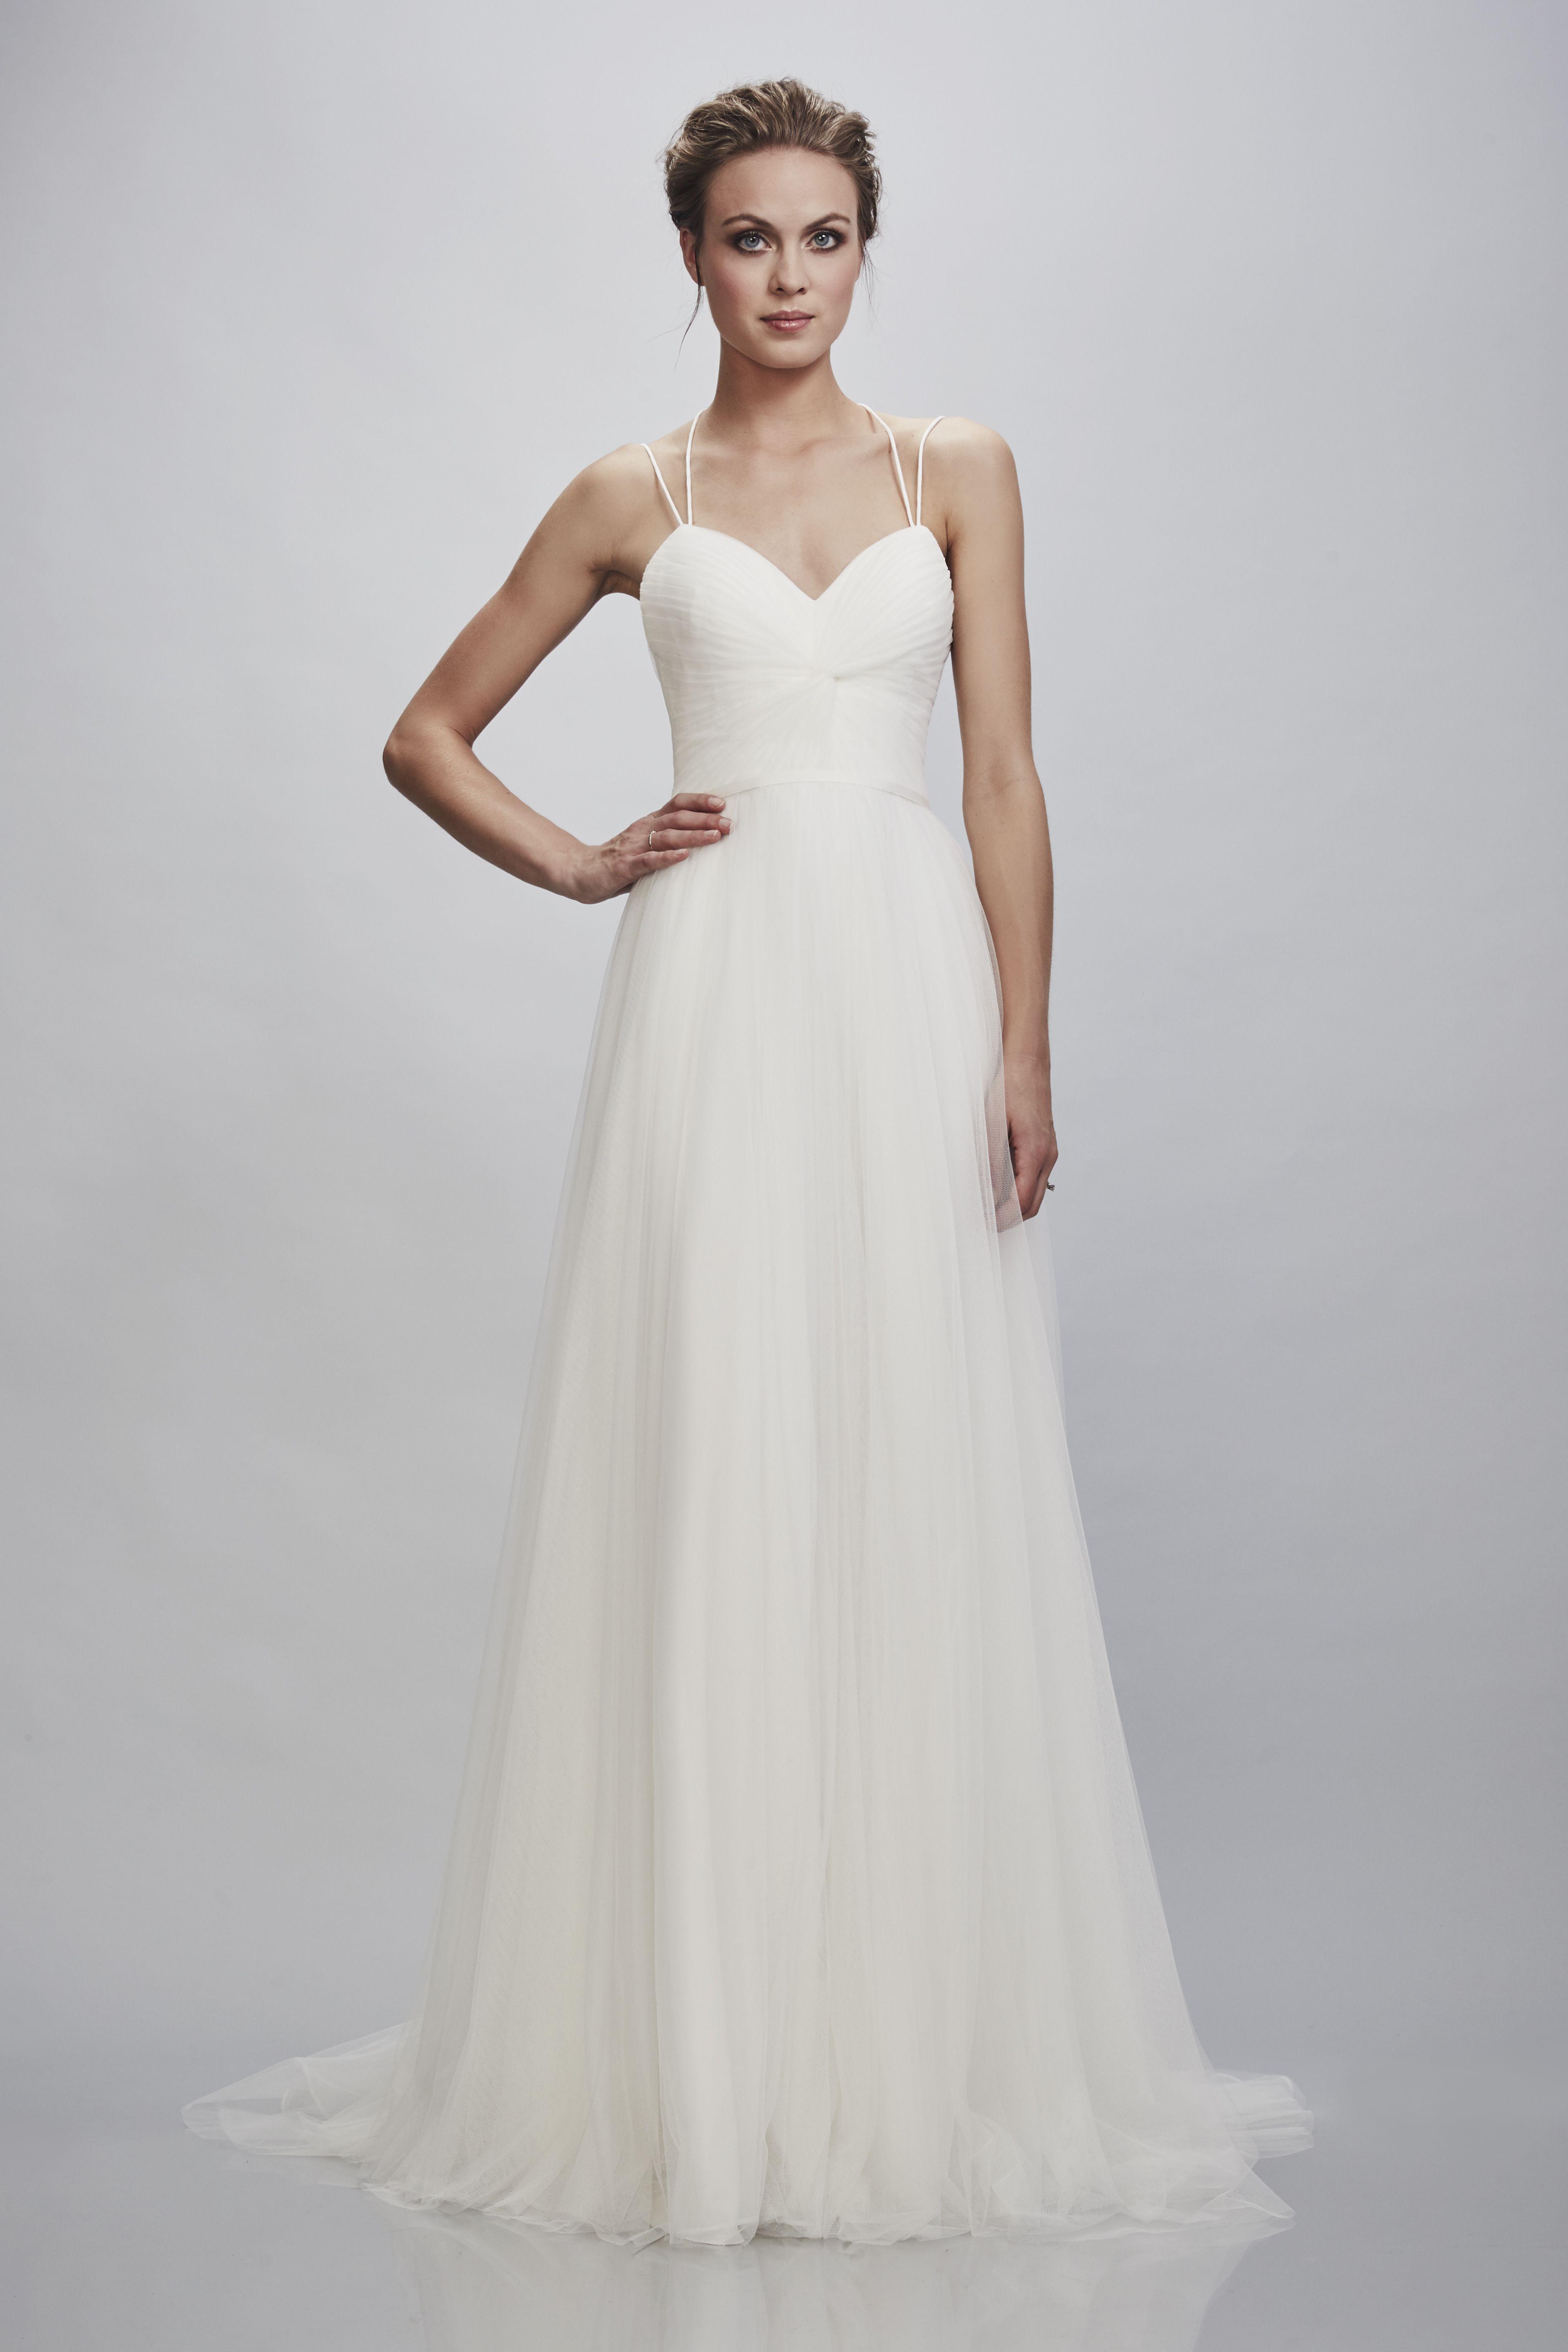 Theia wedding dresses  Sabrina Bridal Gown  THEIA Bridal  Wedding dresses  Pinterest